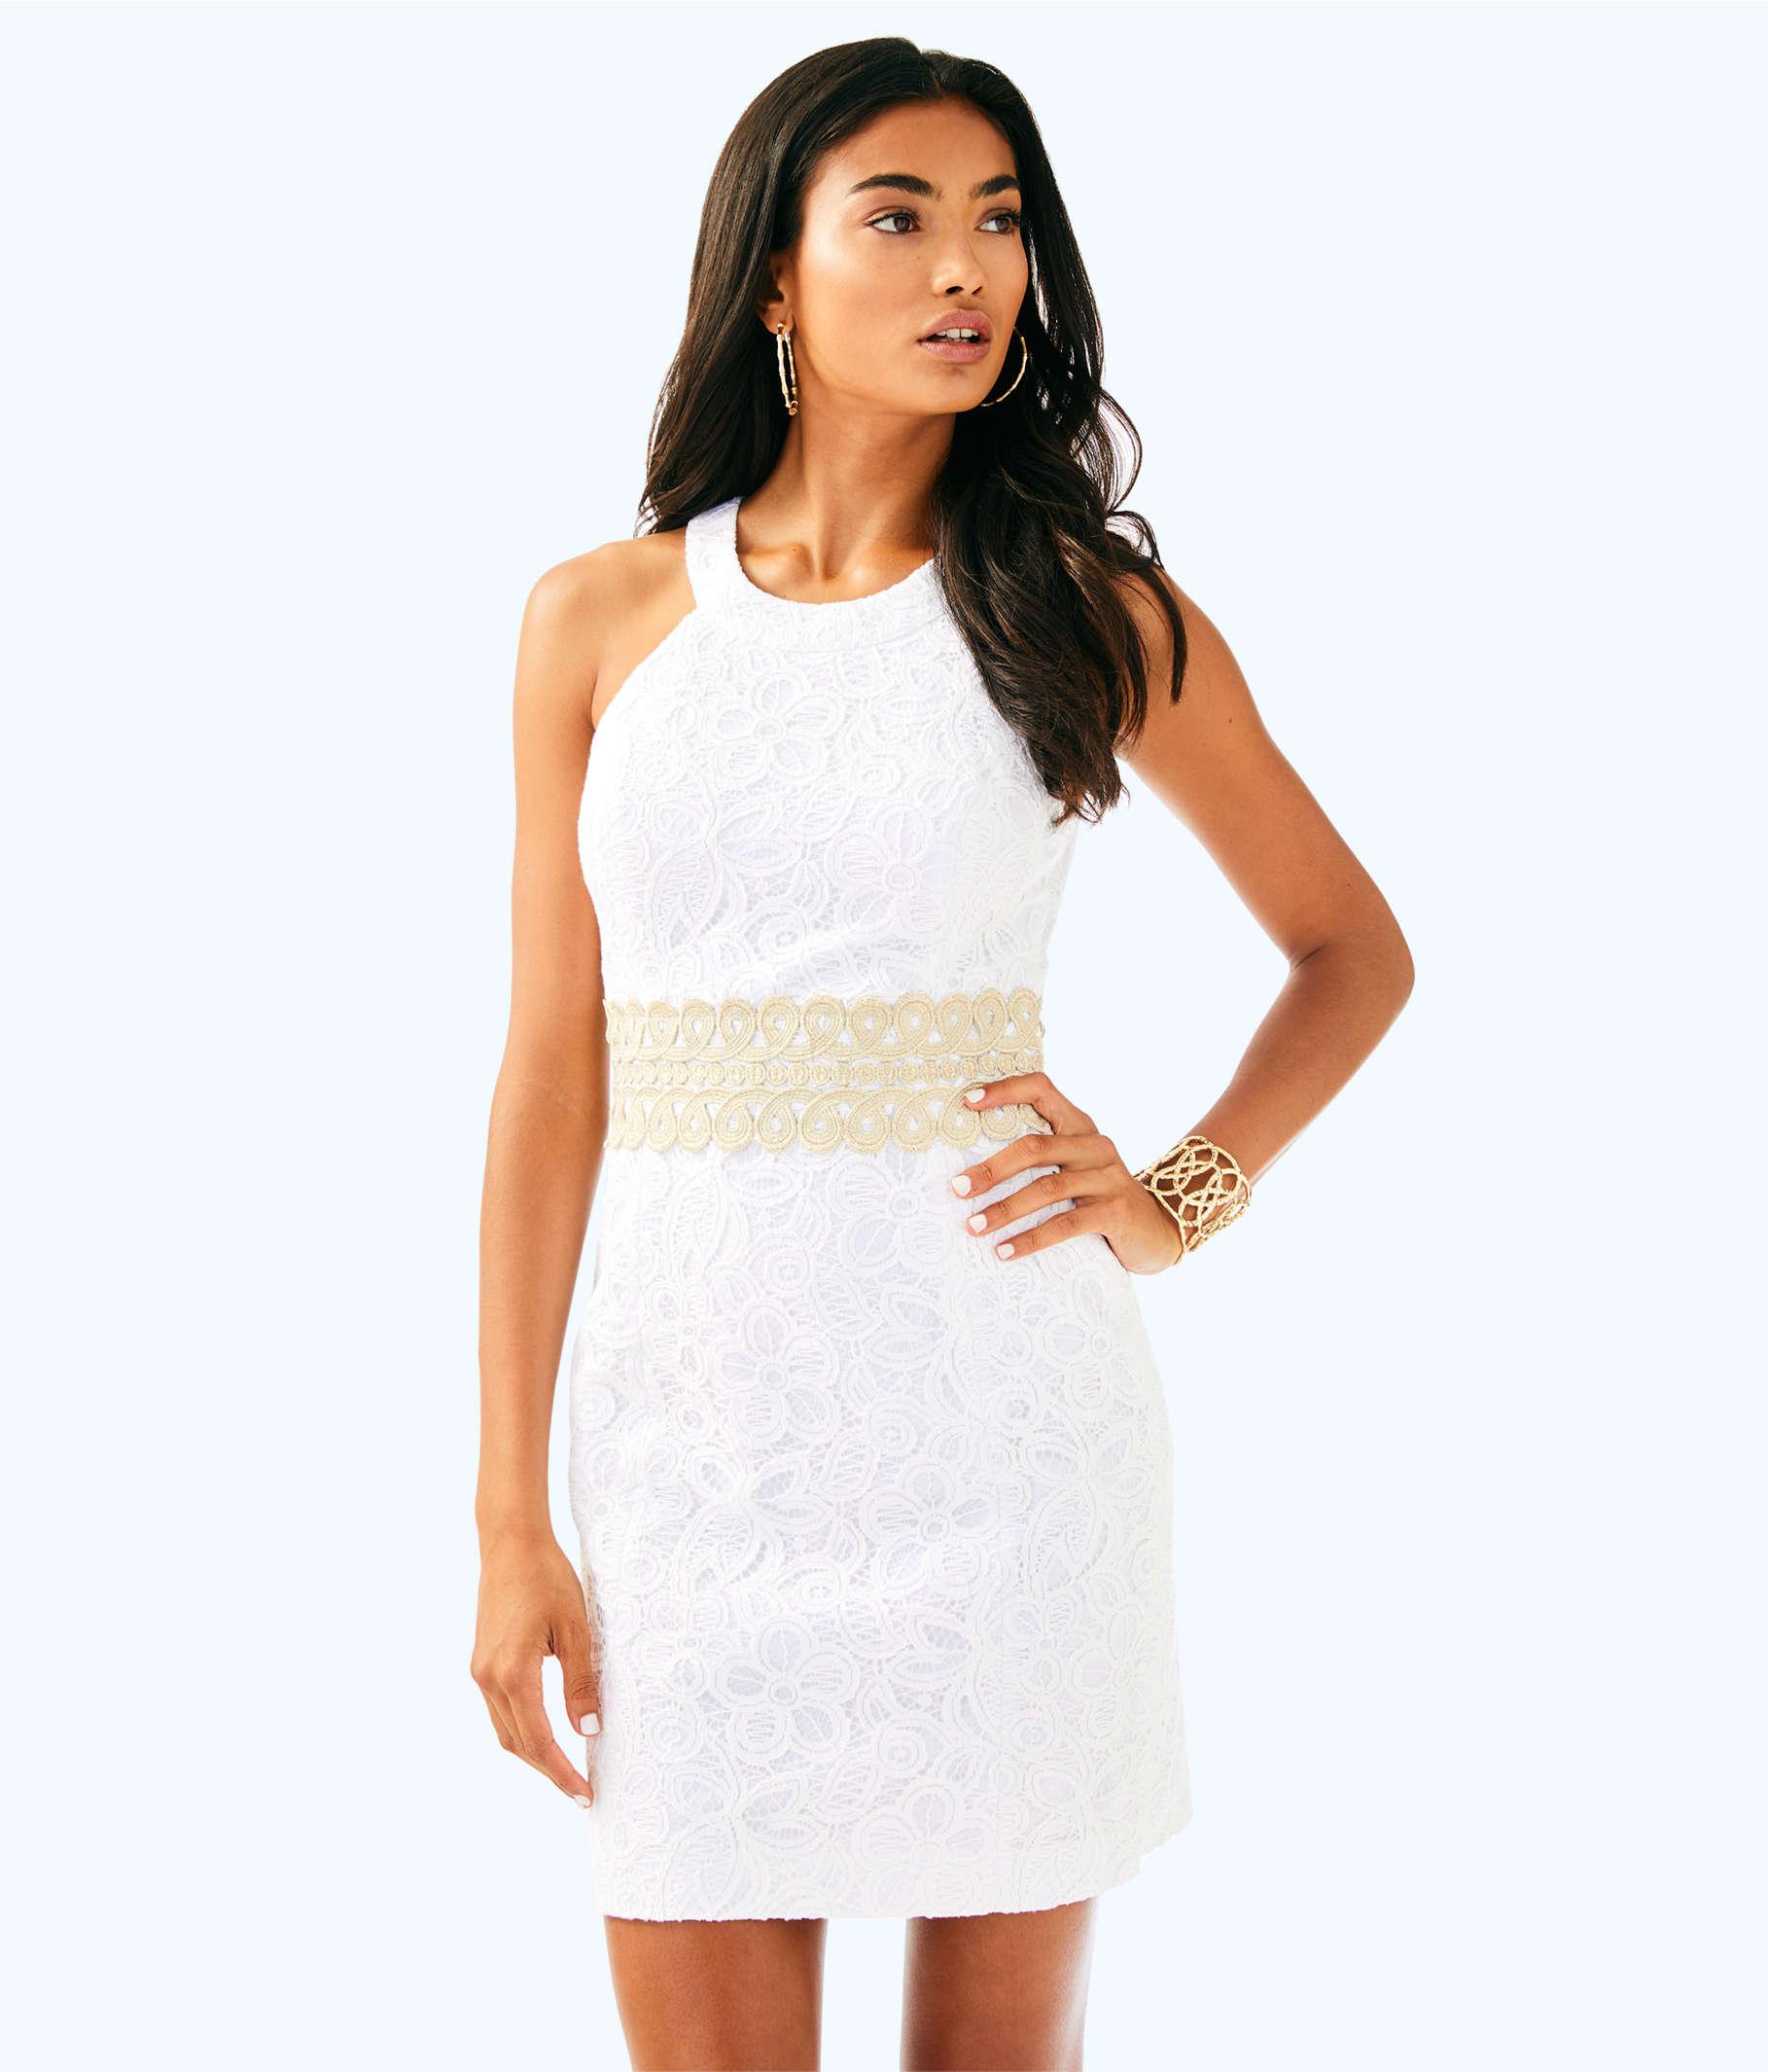 e9c8f58bd78791 ... Ashlyn Shift Dress, Resort White Pop Floral Lace, large ...